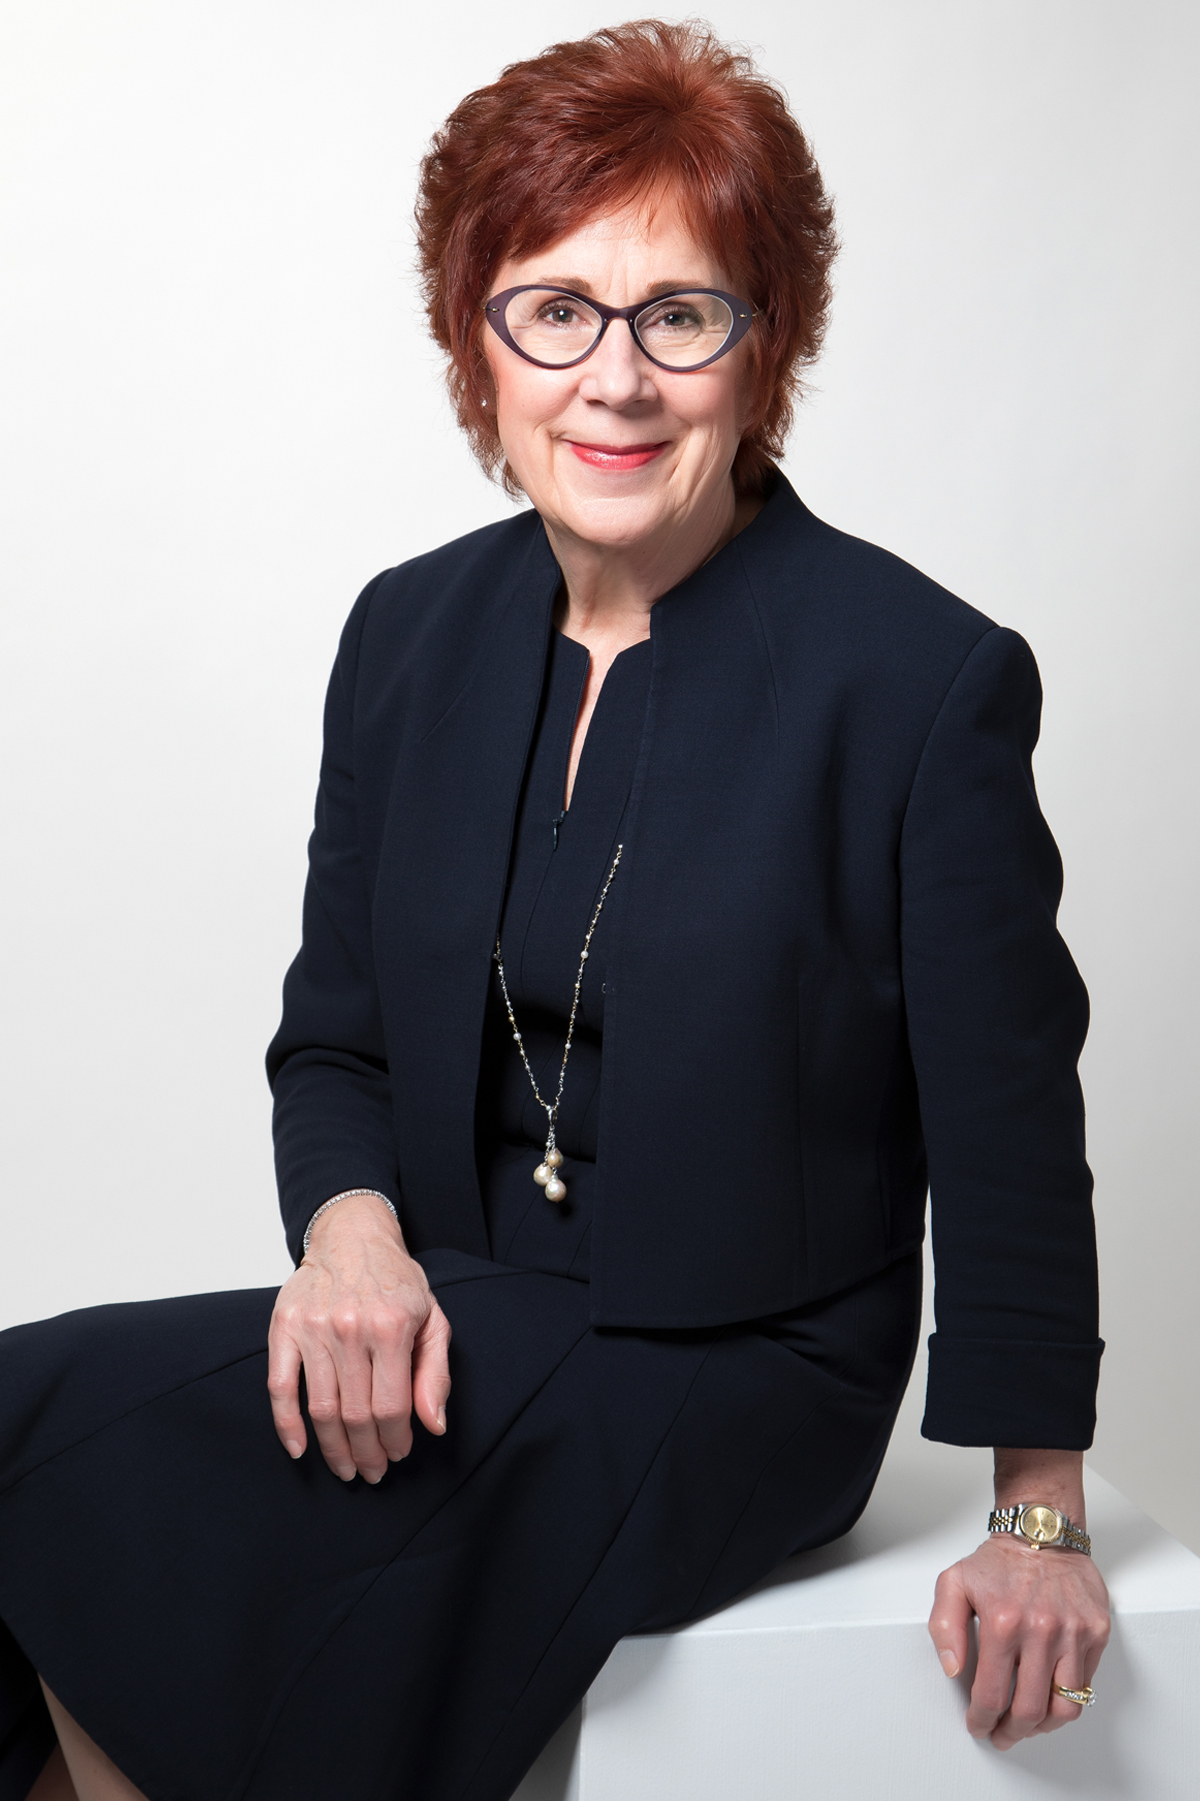 Linda Kelley Ebberson